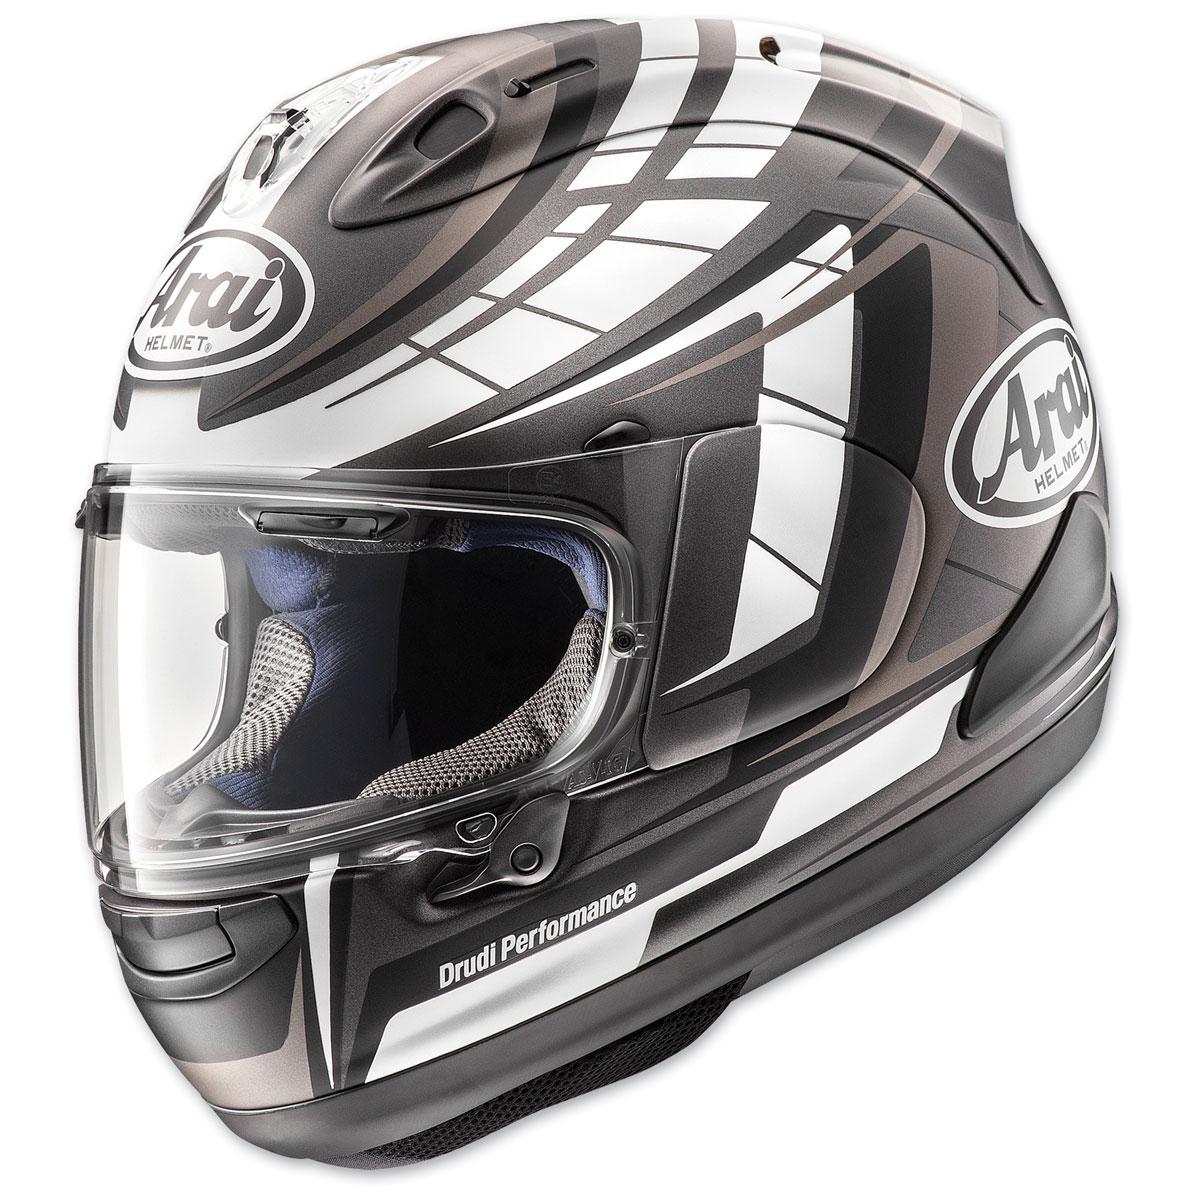 Arai Corsair-X Planet Black Frost Full Face Helmet